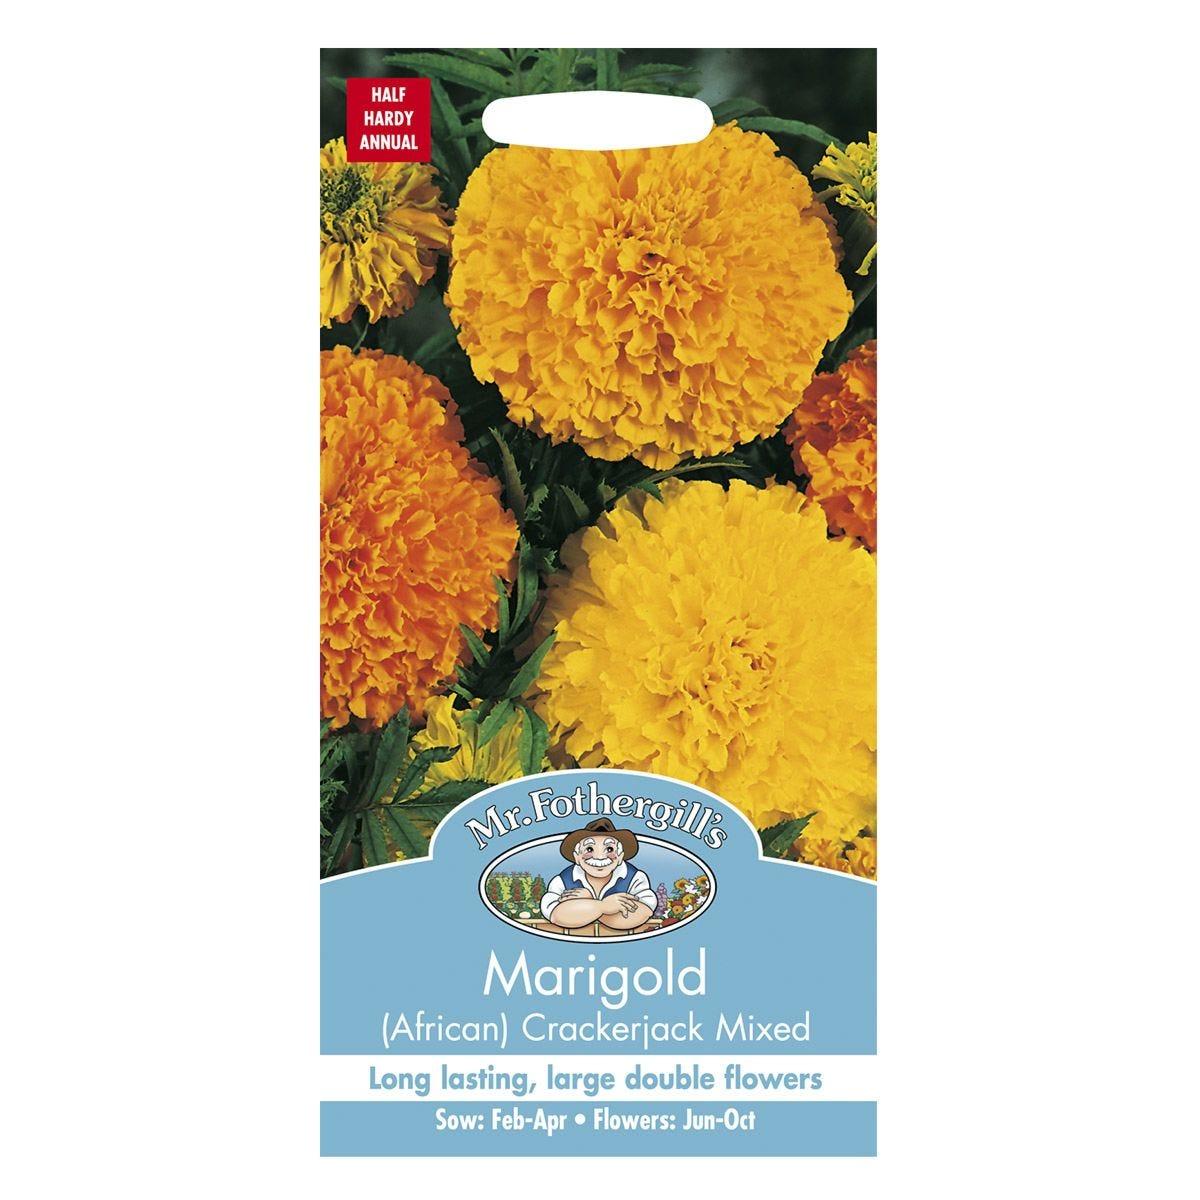 Mr Fothergill's Marigold (African) Crackerjack Mixed Seeds